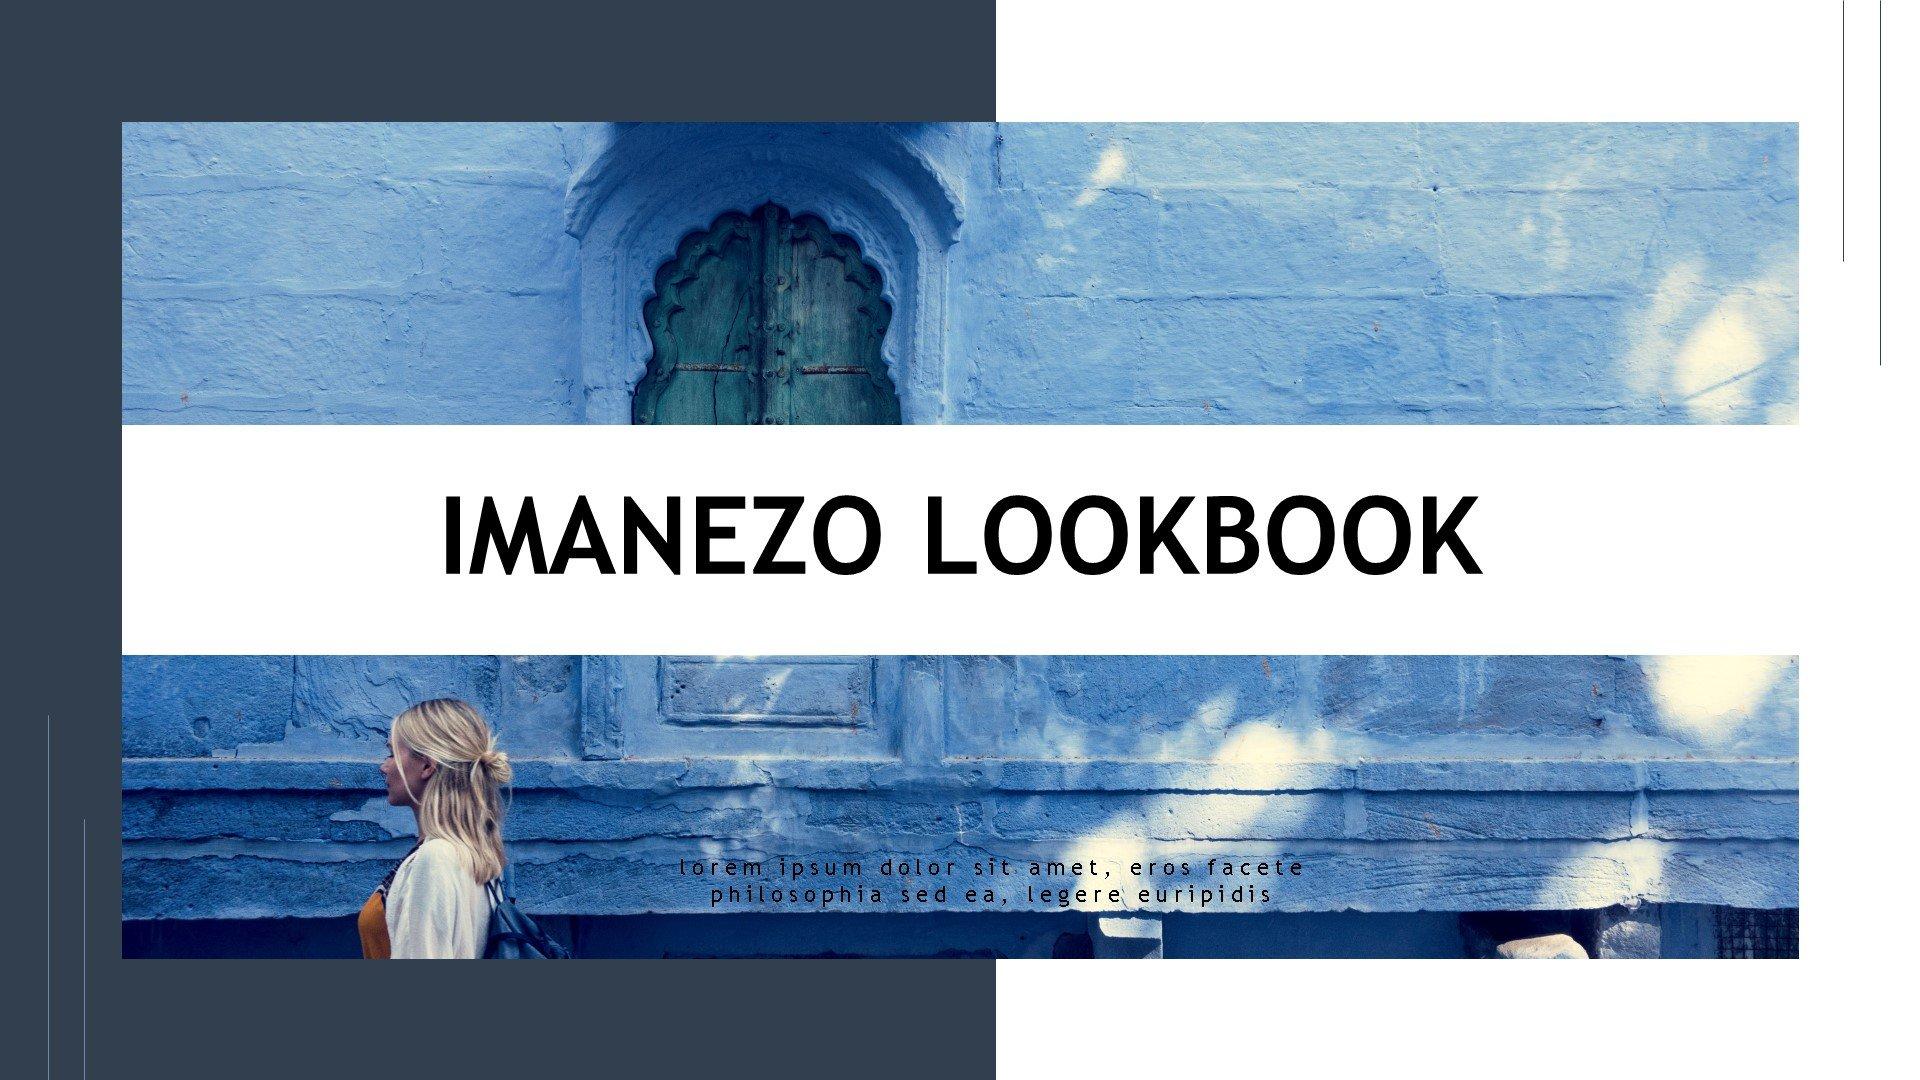 Imanezo - Lookbook Presentaion PowerPoint Template - screenshot